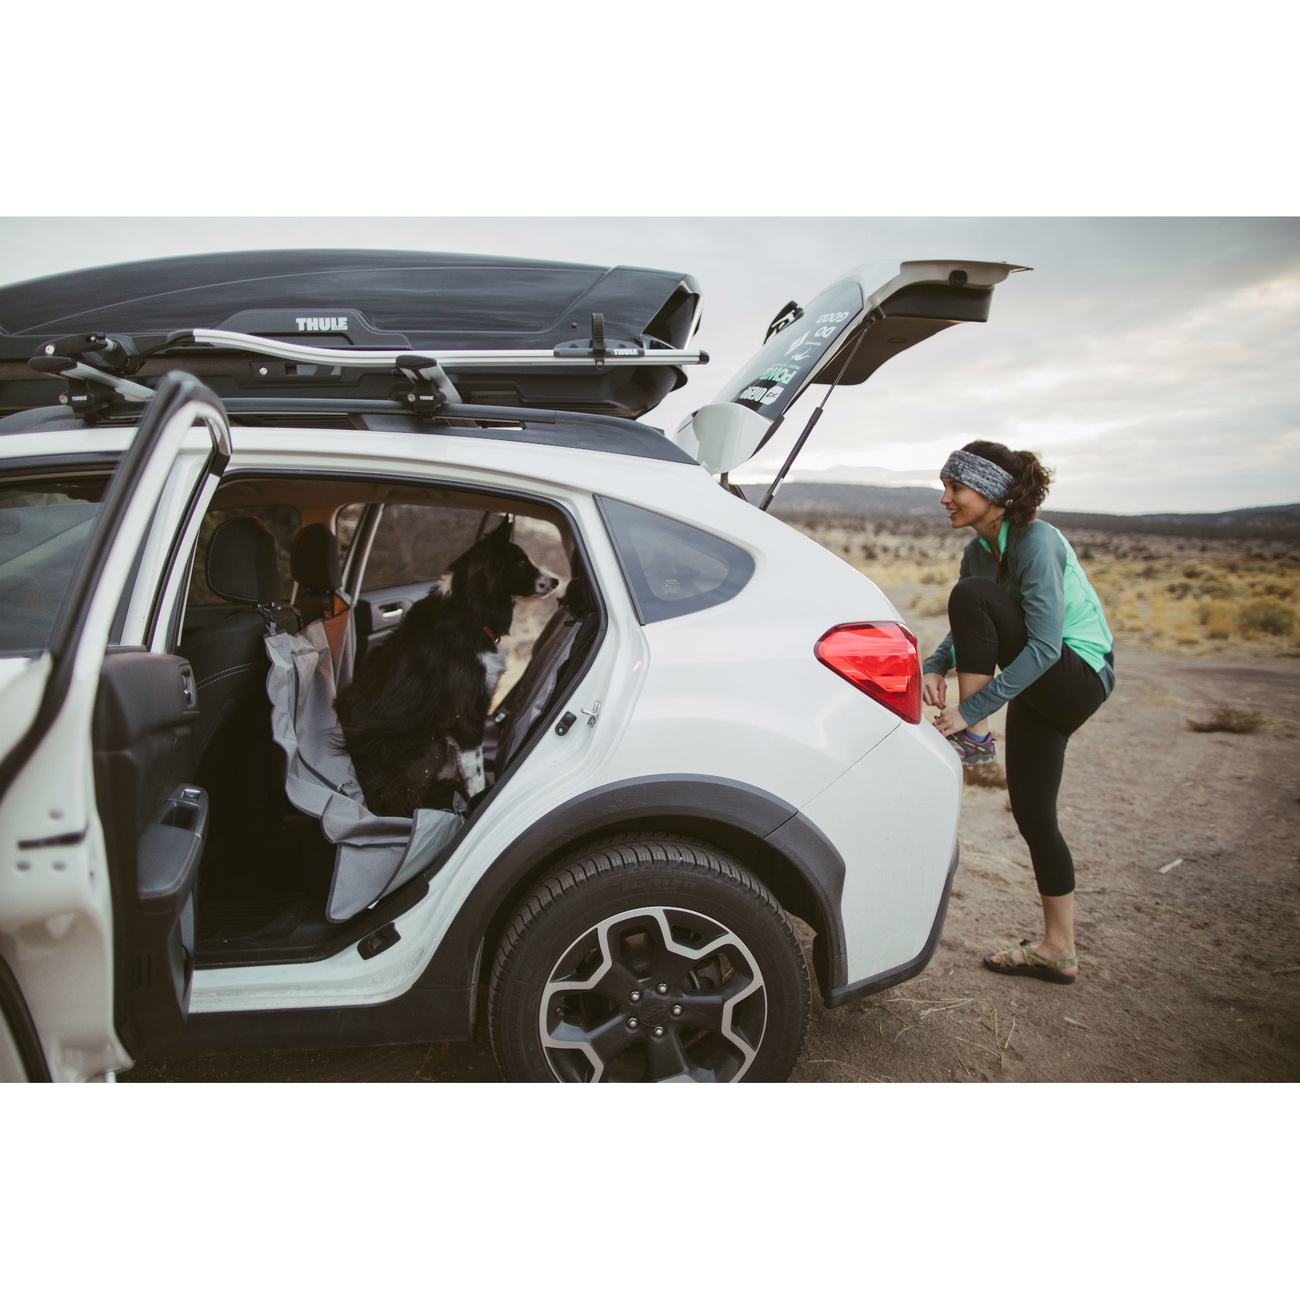 Ruffwear Dirtbag Seat Cover Autoschutzdecke, Bild 14